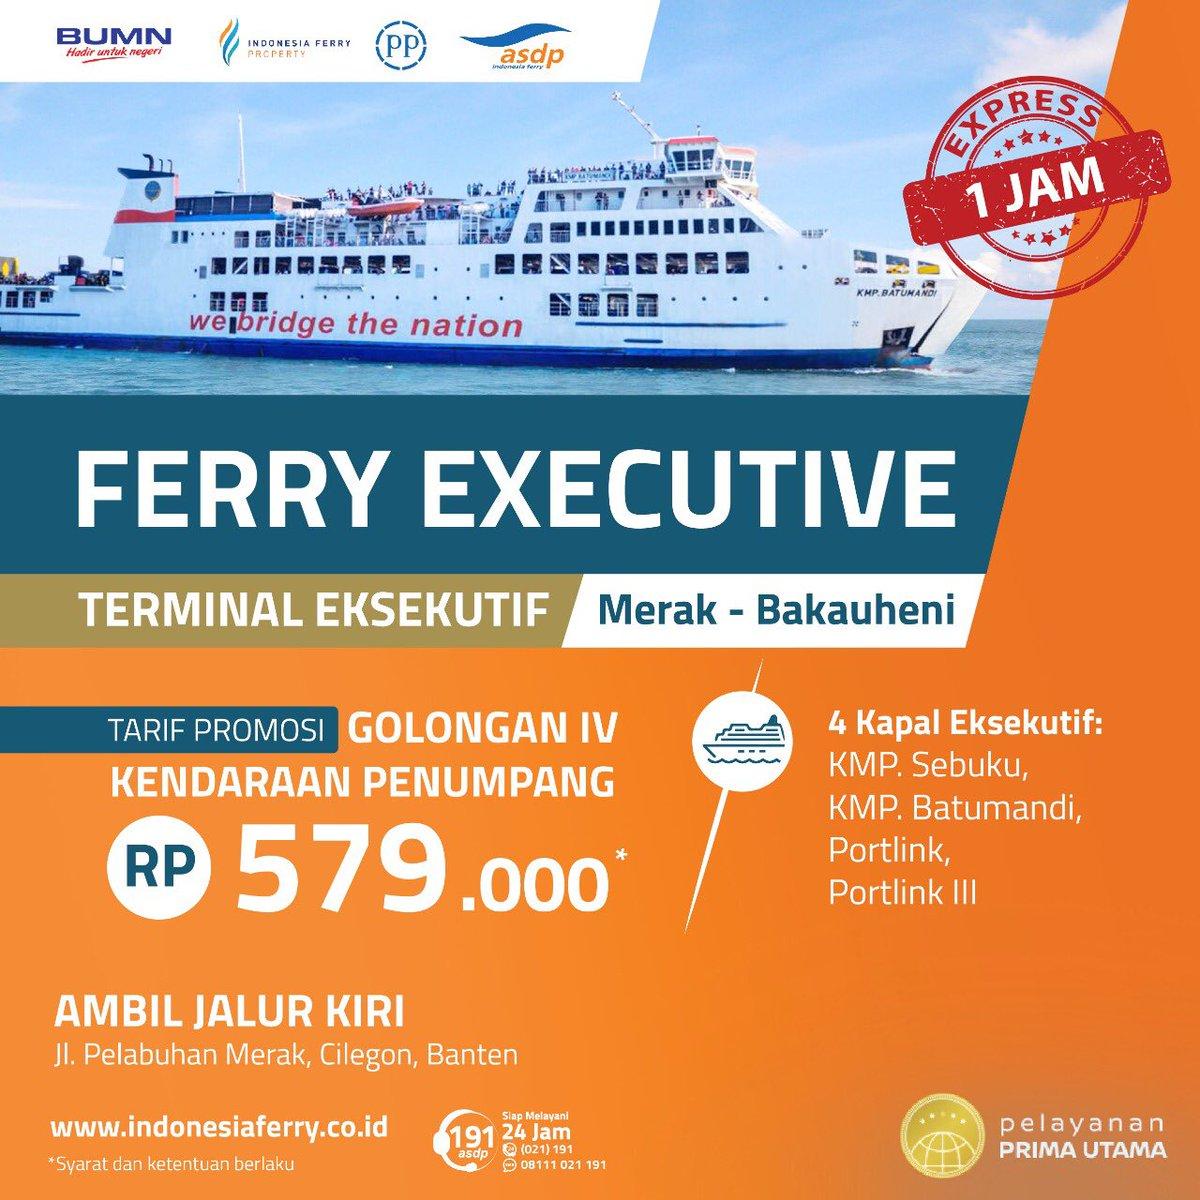 Asdp Indonesia Ferry On Twitter Hai Kawanasdp Ferry